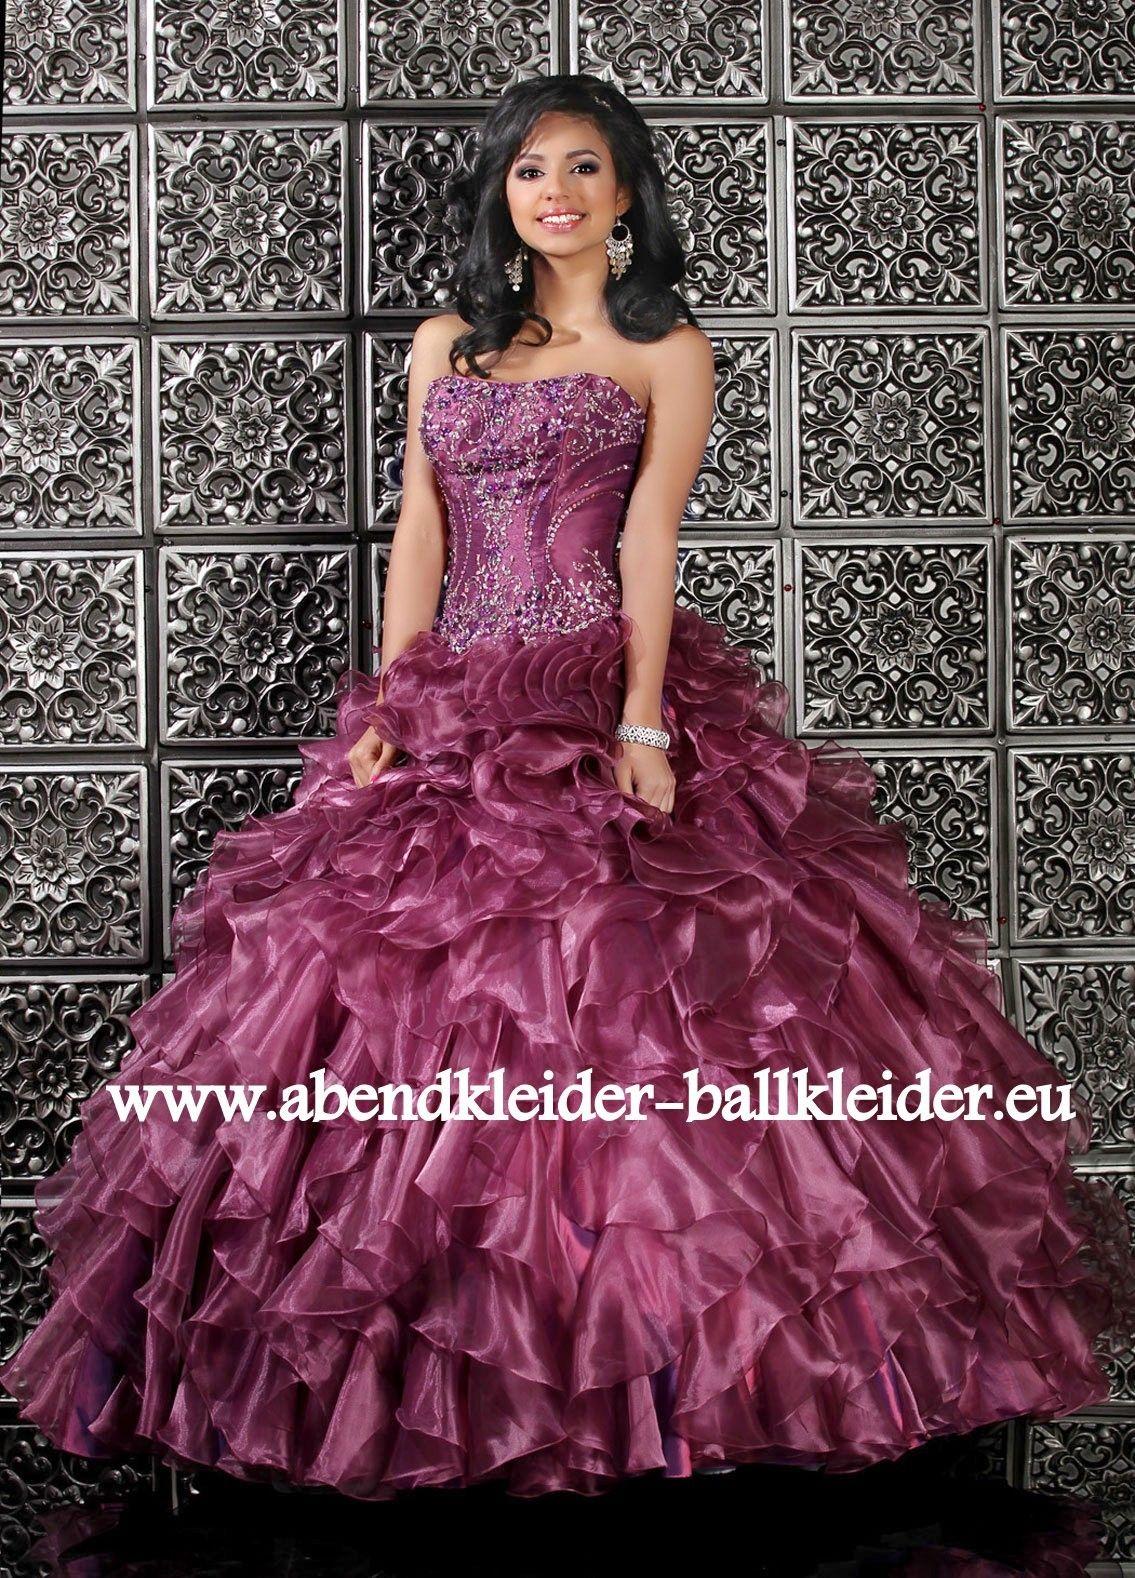 modernes abendkleid ballkleid online in lila alexander